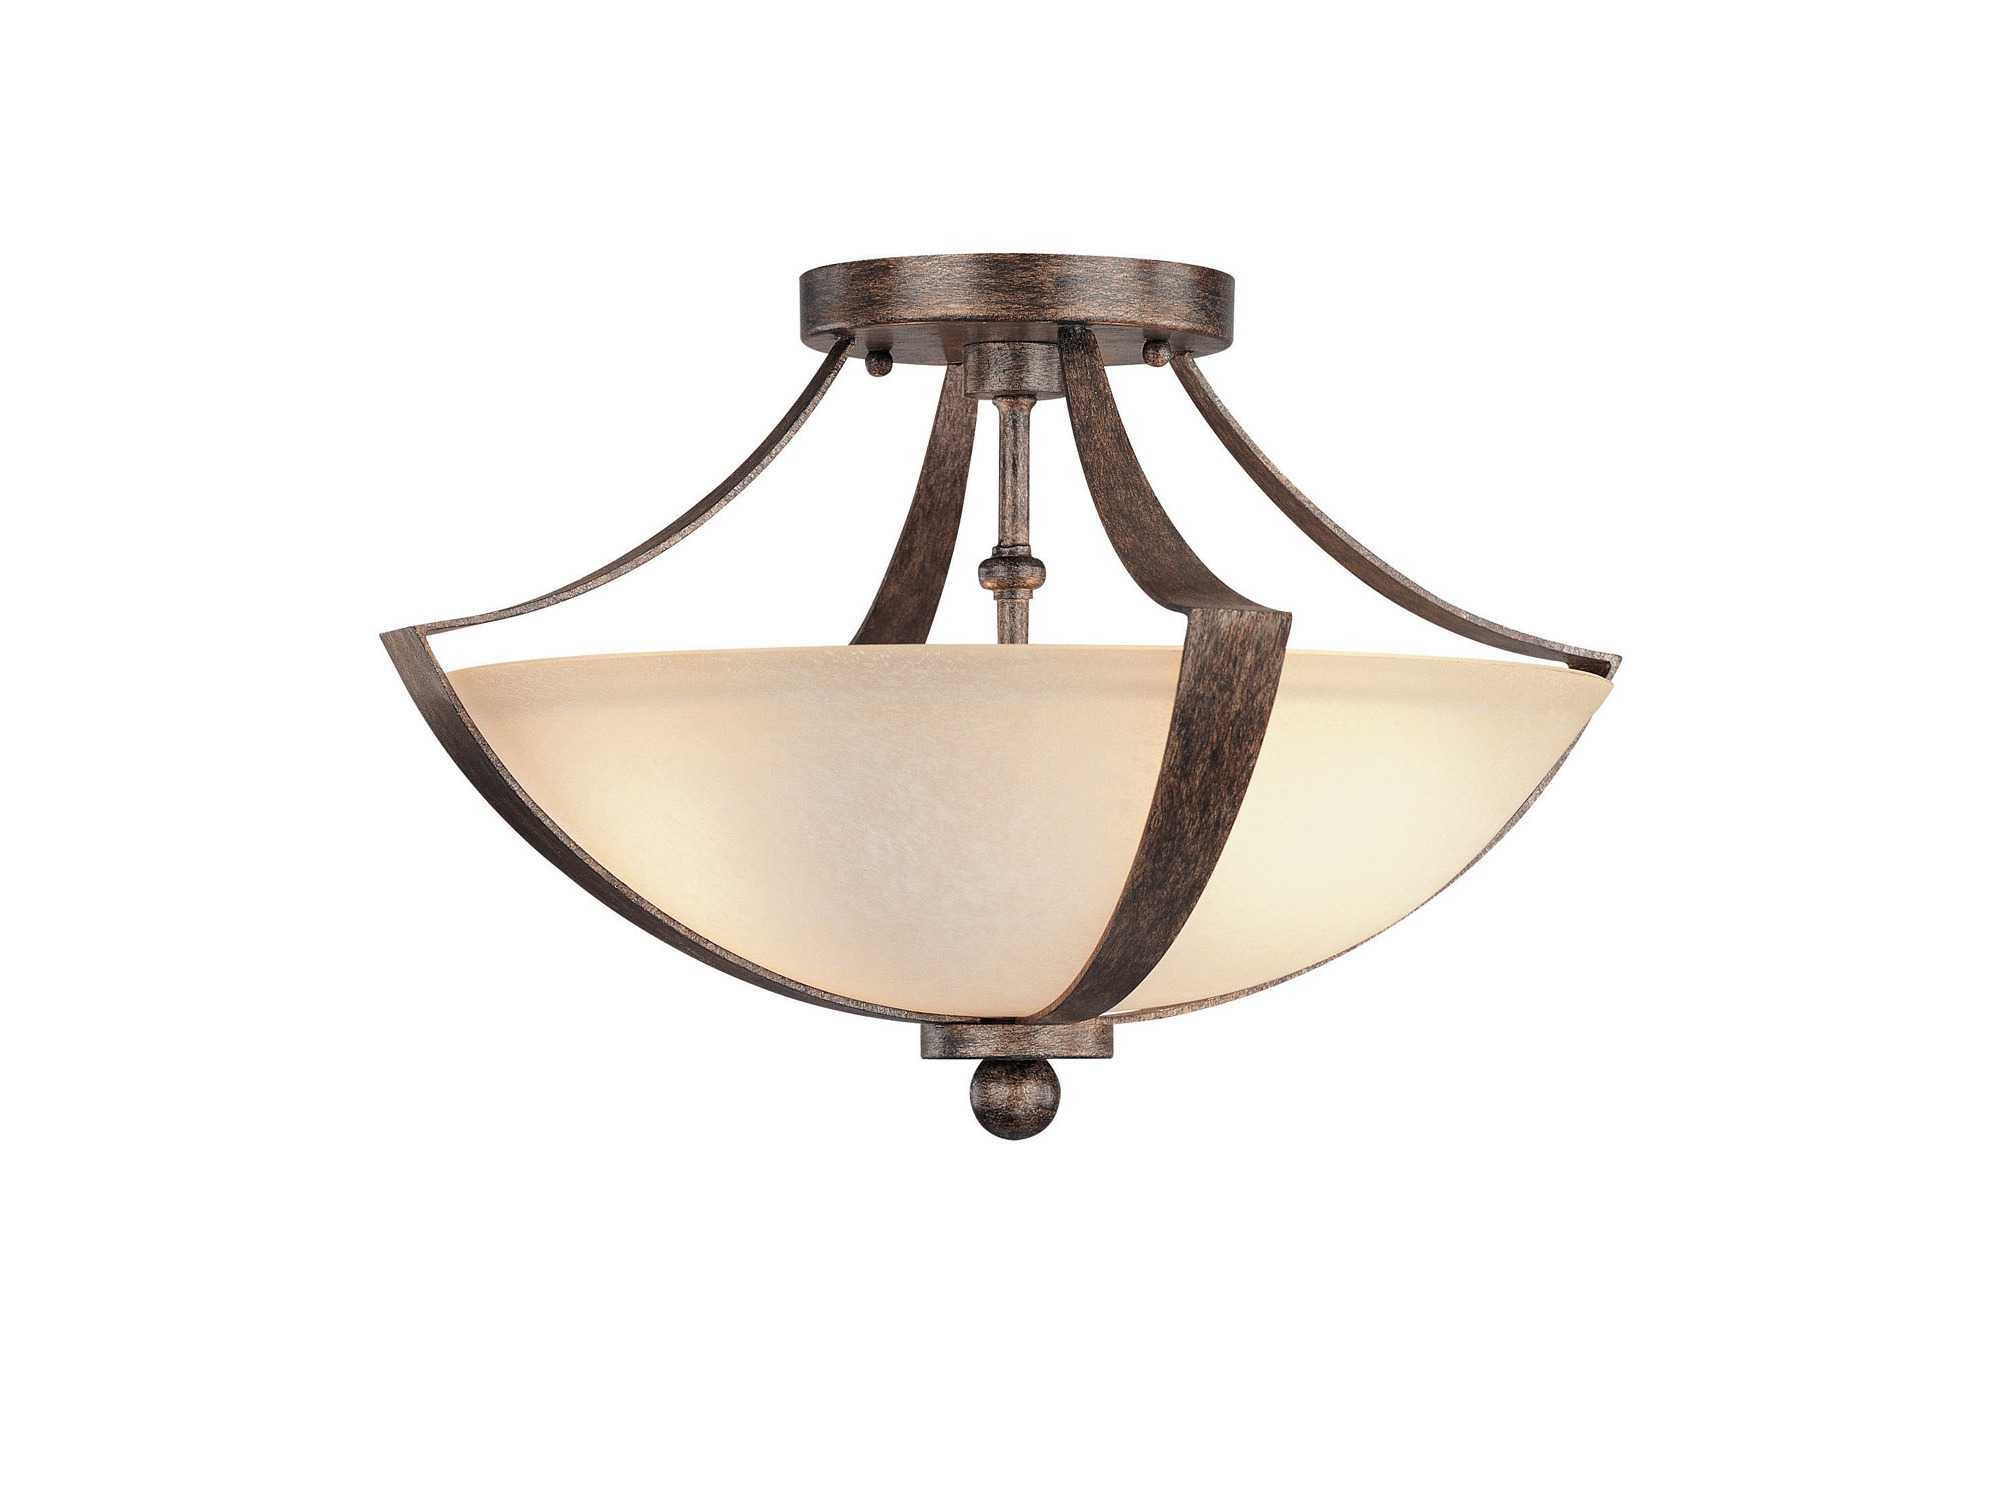 capital lighting soho rustic two light semi flush mount light 4334rt. Black Bedroom Furniture Sets. Home Design Ideas